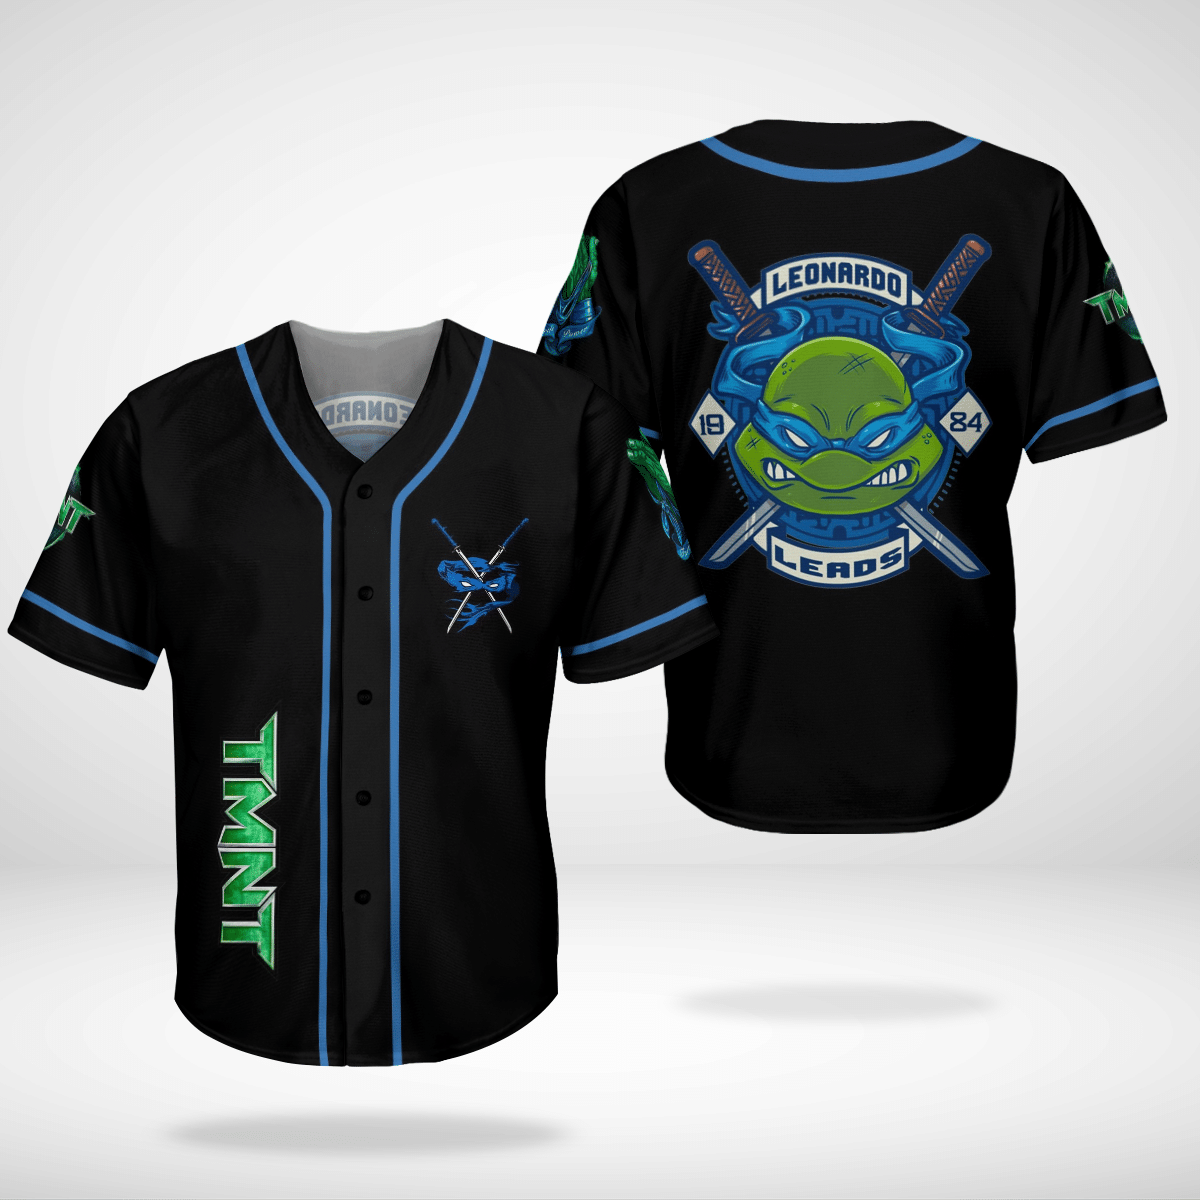 Leonardo TMNT Ninja Turtles baseball Jersey shirt